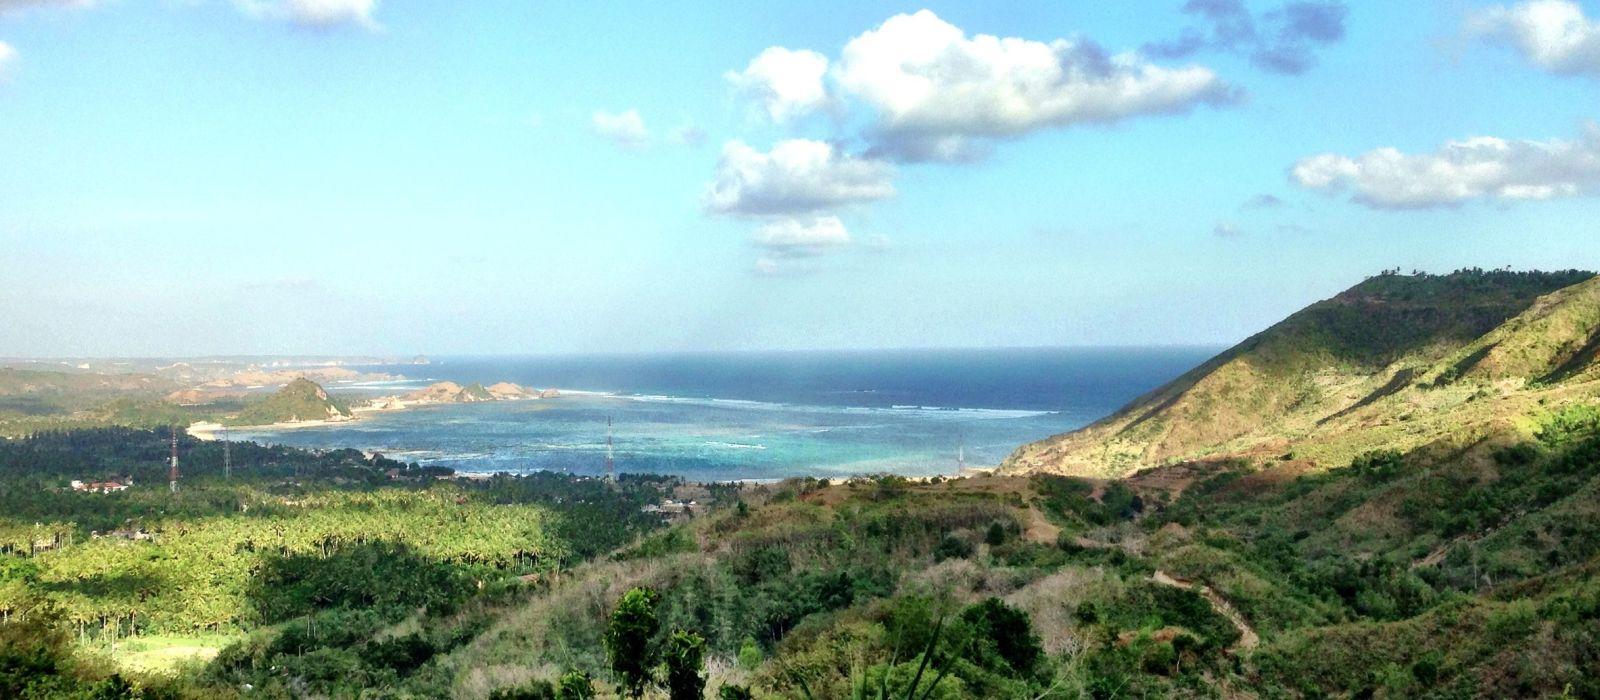 Reiseziel Lombok Indonesien